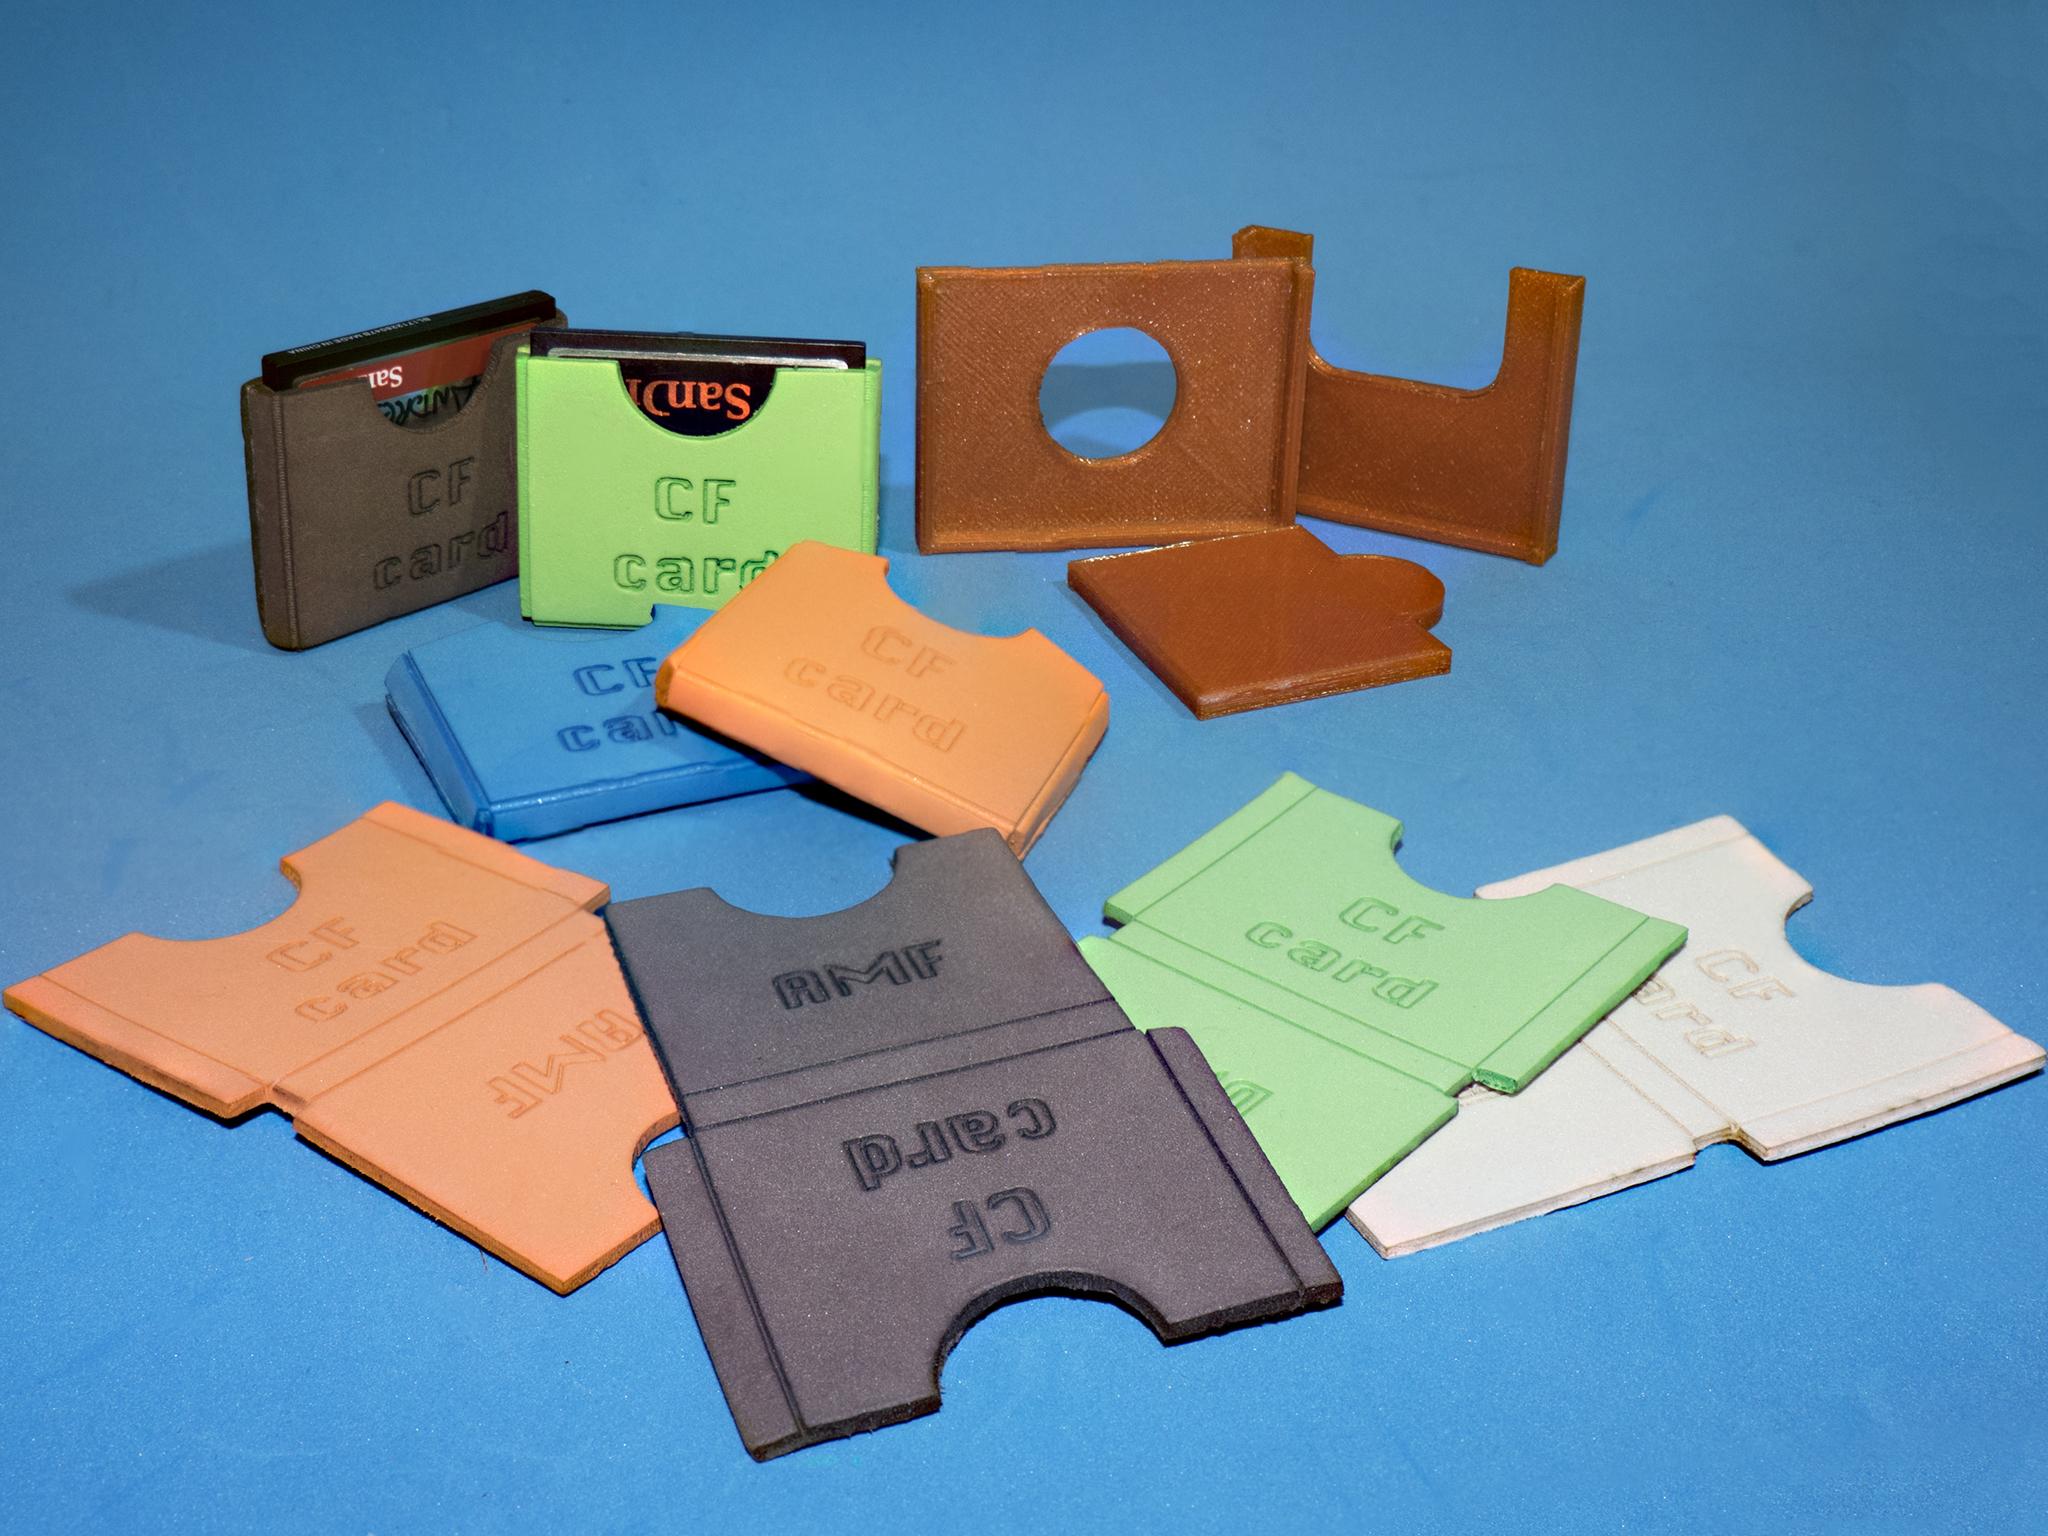 1.jpg Download free STL file Lasercut EVA foam CF Card sleeve + gluing jig • 3D printing template, dancingchicken